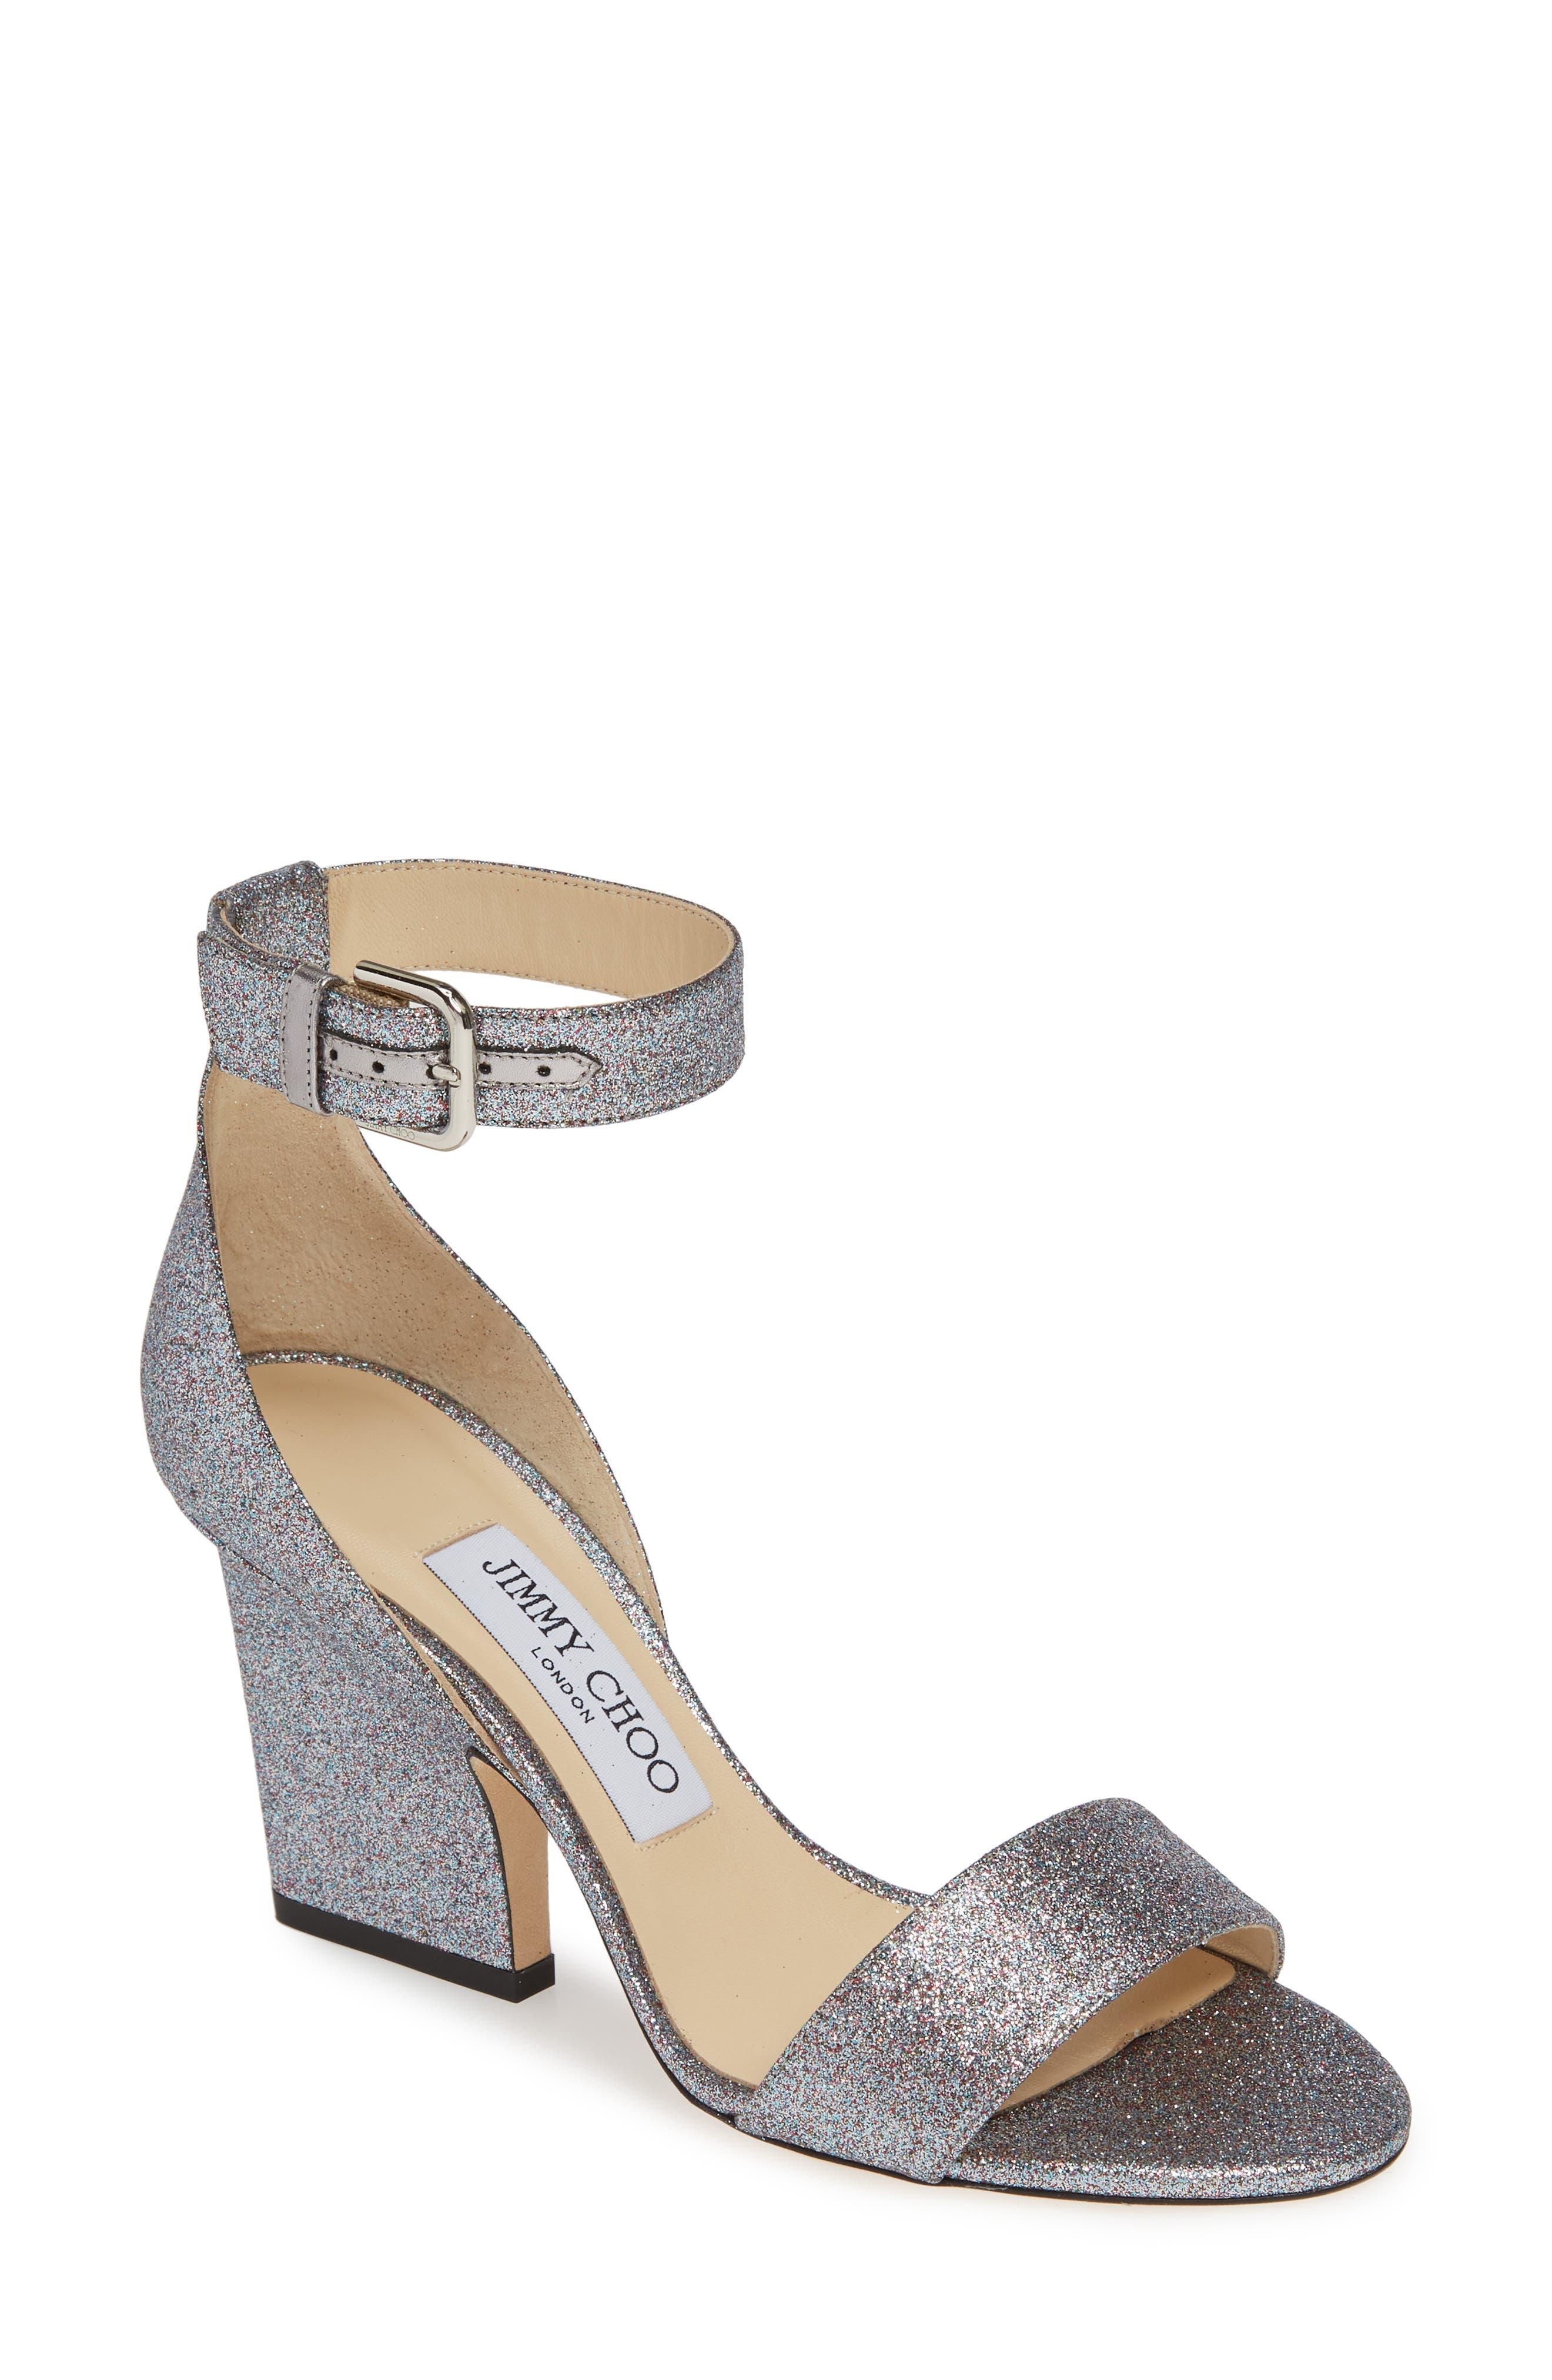 Jimmy Choo Edina Ankle Strap Sandal, Metallic